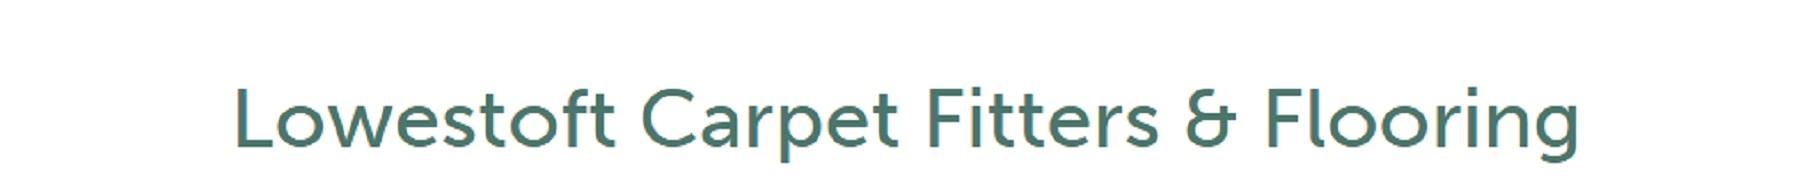 Lowestoft Carpet Fitters & Flooring